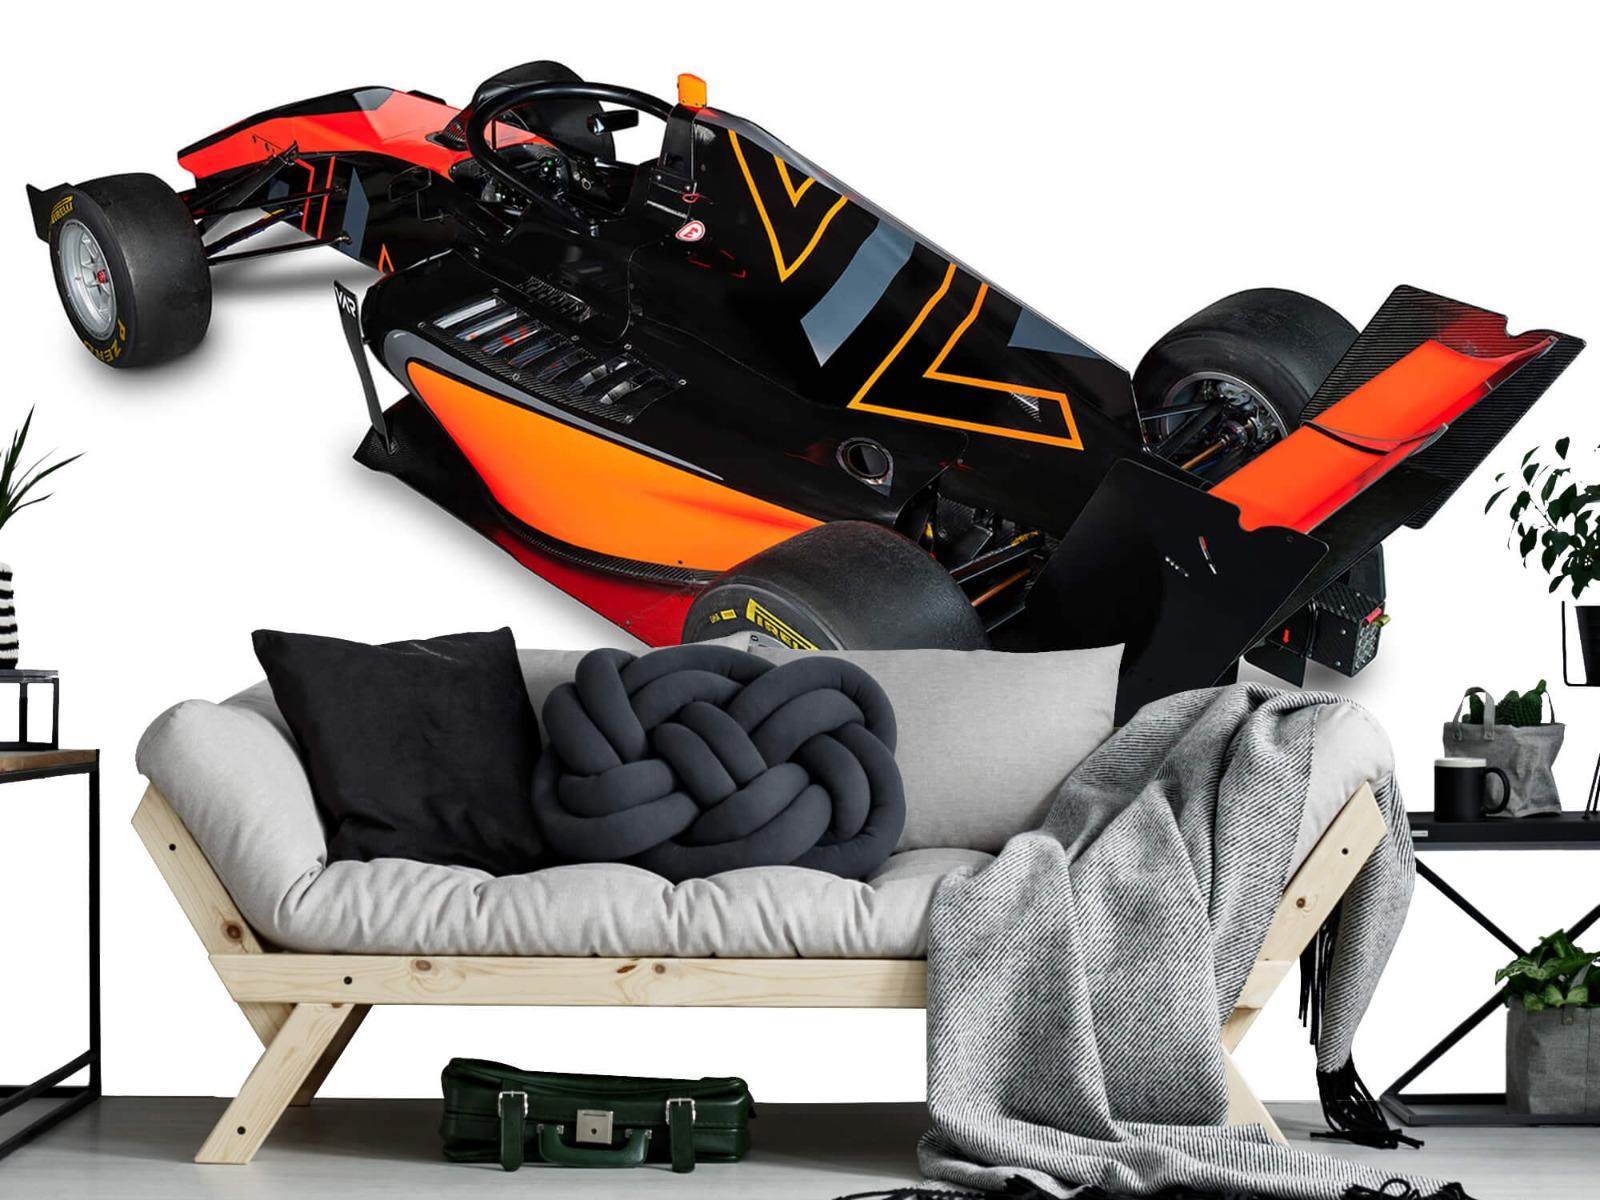 Sportauto's - Formula 3 - Rear left view - Hobbykamer 7